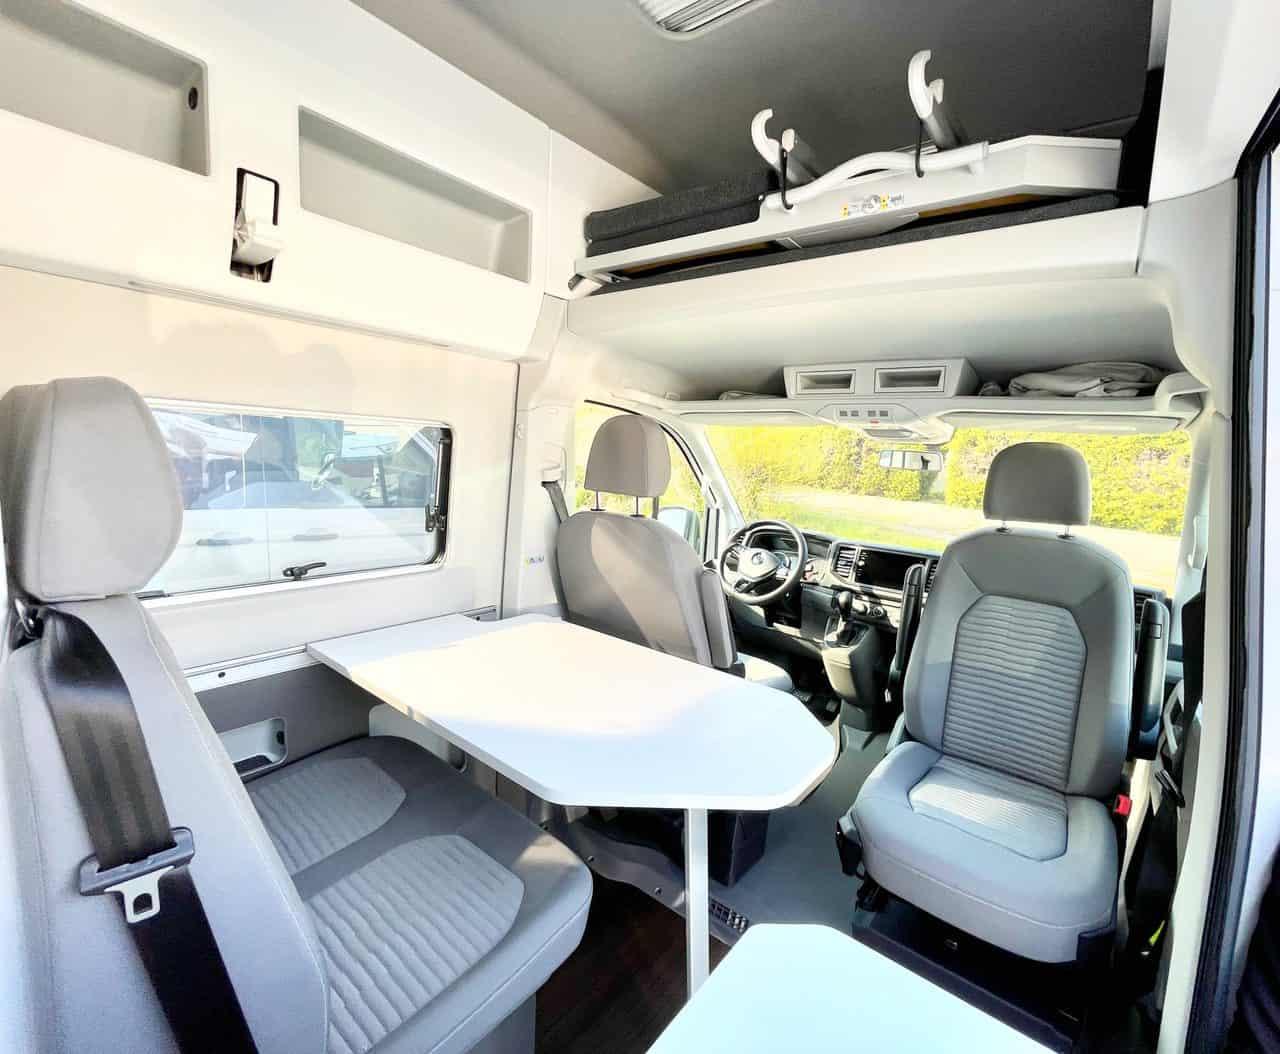 Camerboys-Camper-Wohnmobil-Vermietung-VW-Grand-California-Essbereich-Fahrbereich